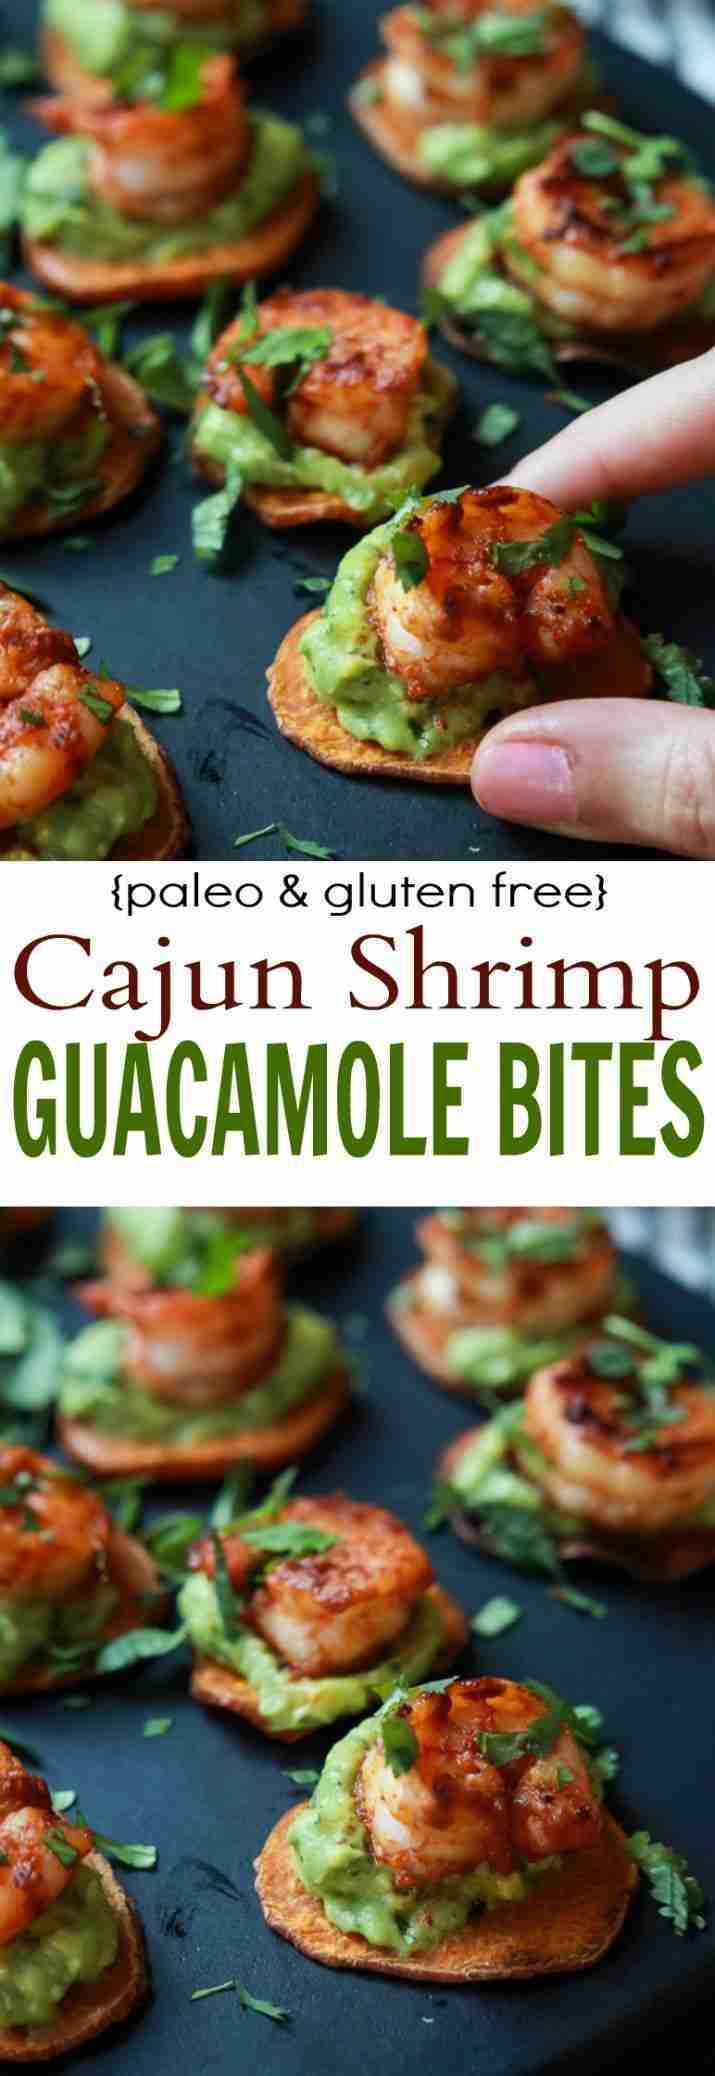 Cajun Shrimp Guacamole Bites   Paleo & Gluten Free Appetizer